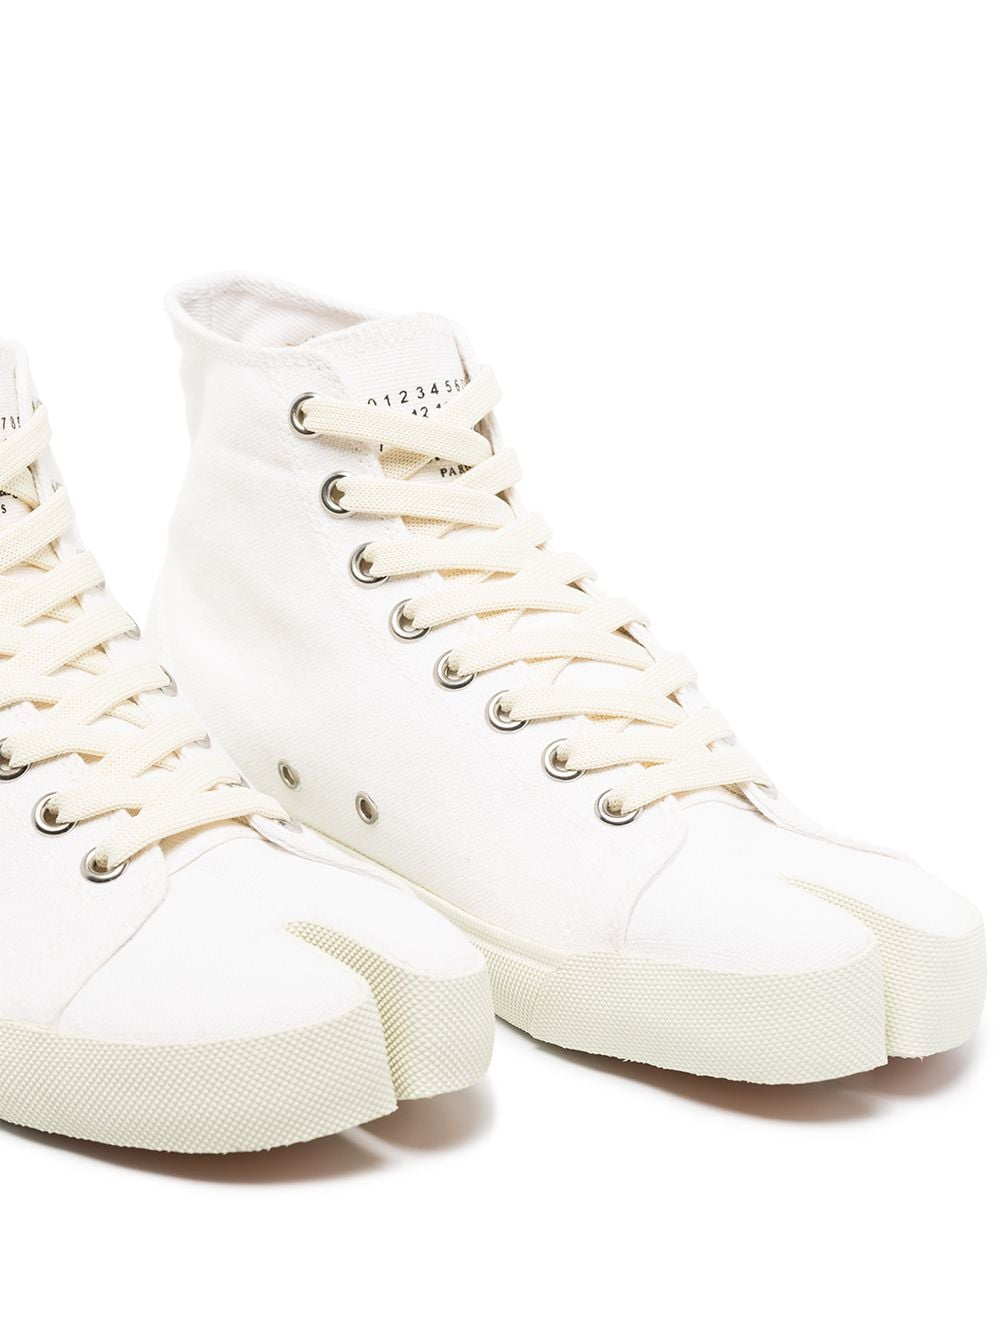 Tabi ハイカットスニーカー tabi-sneakers-trend-maison-margeila-tabi-highcut-2